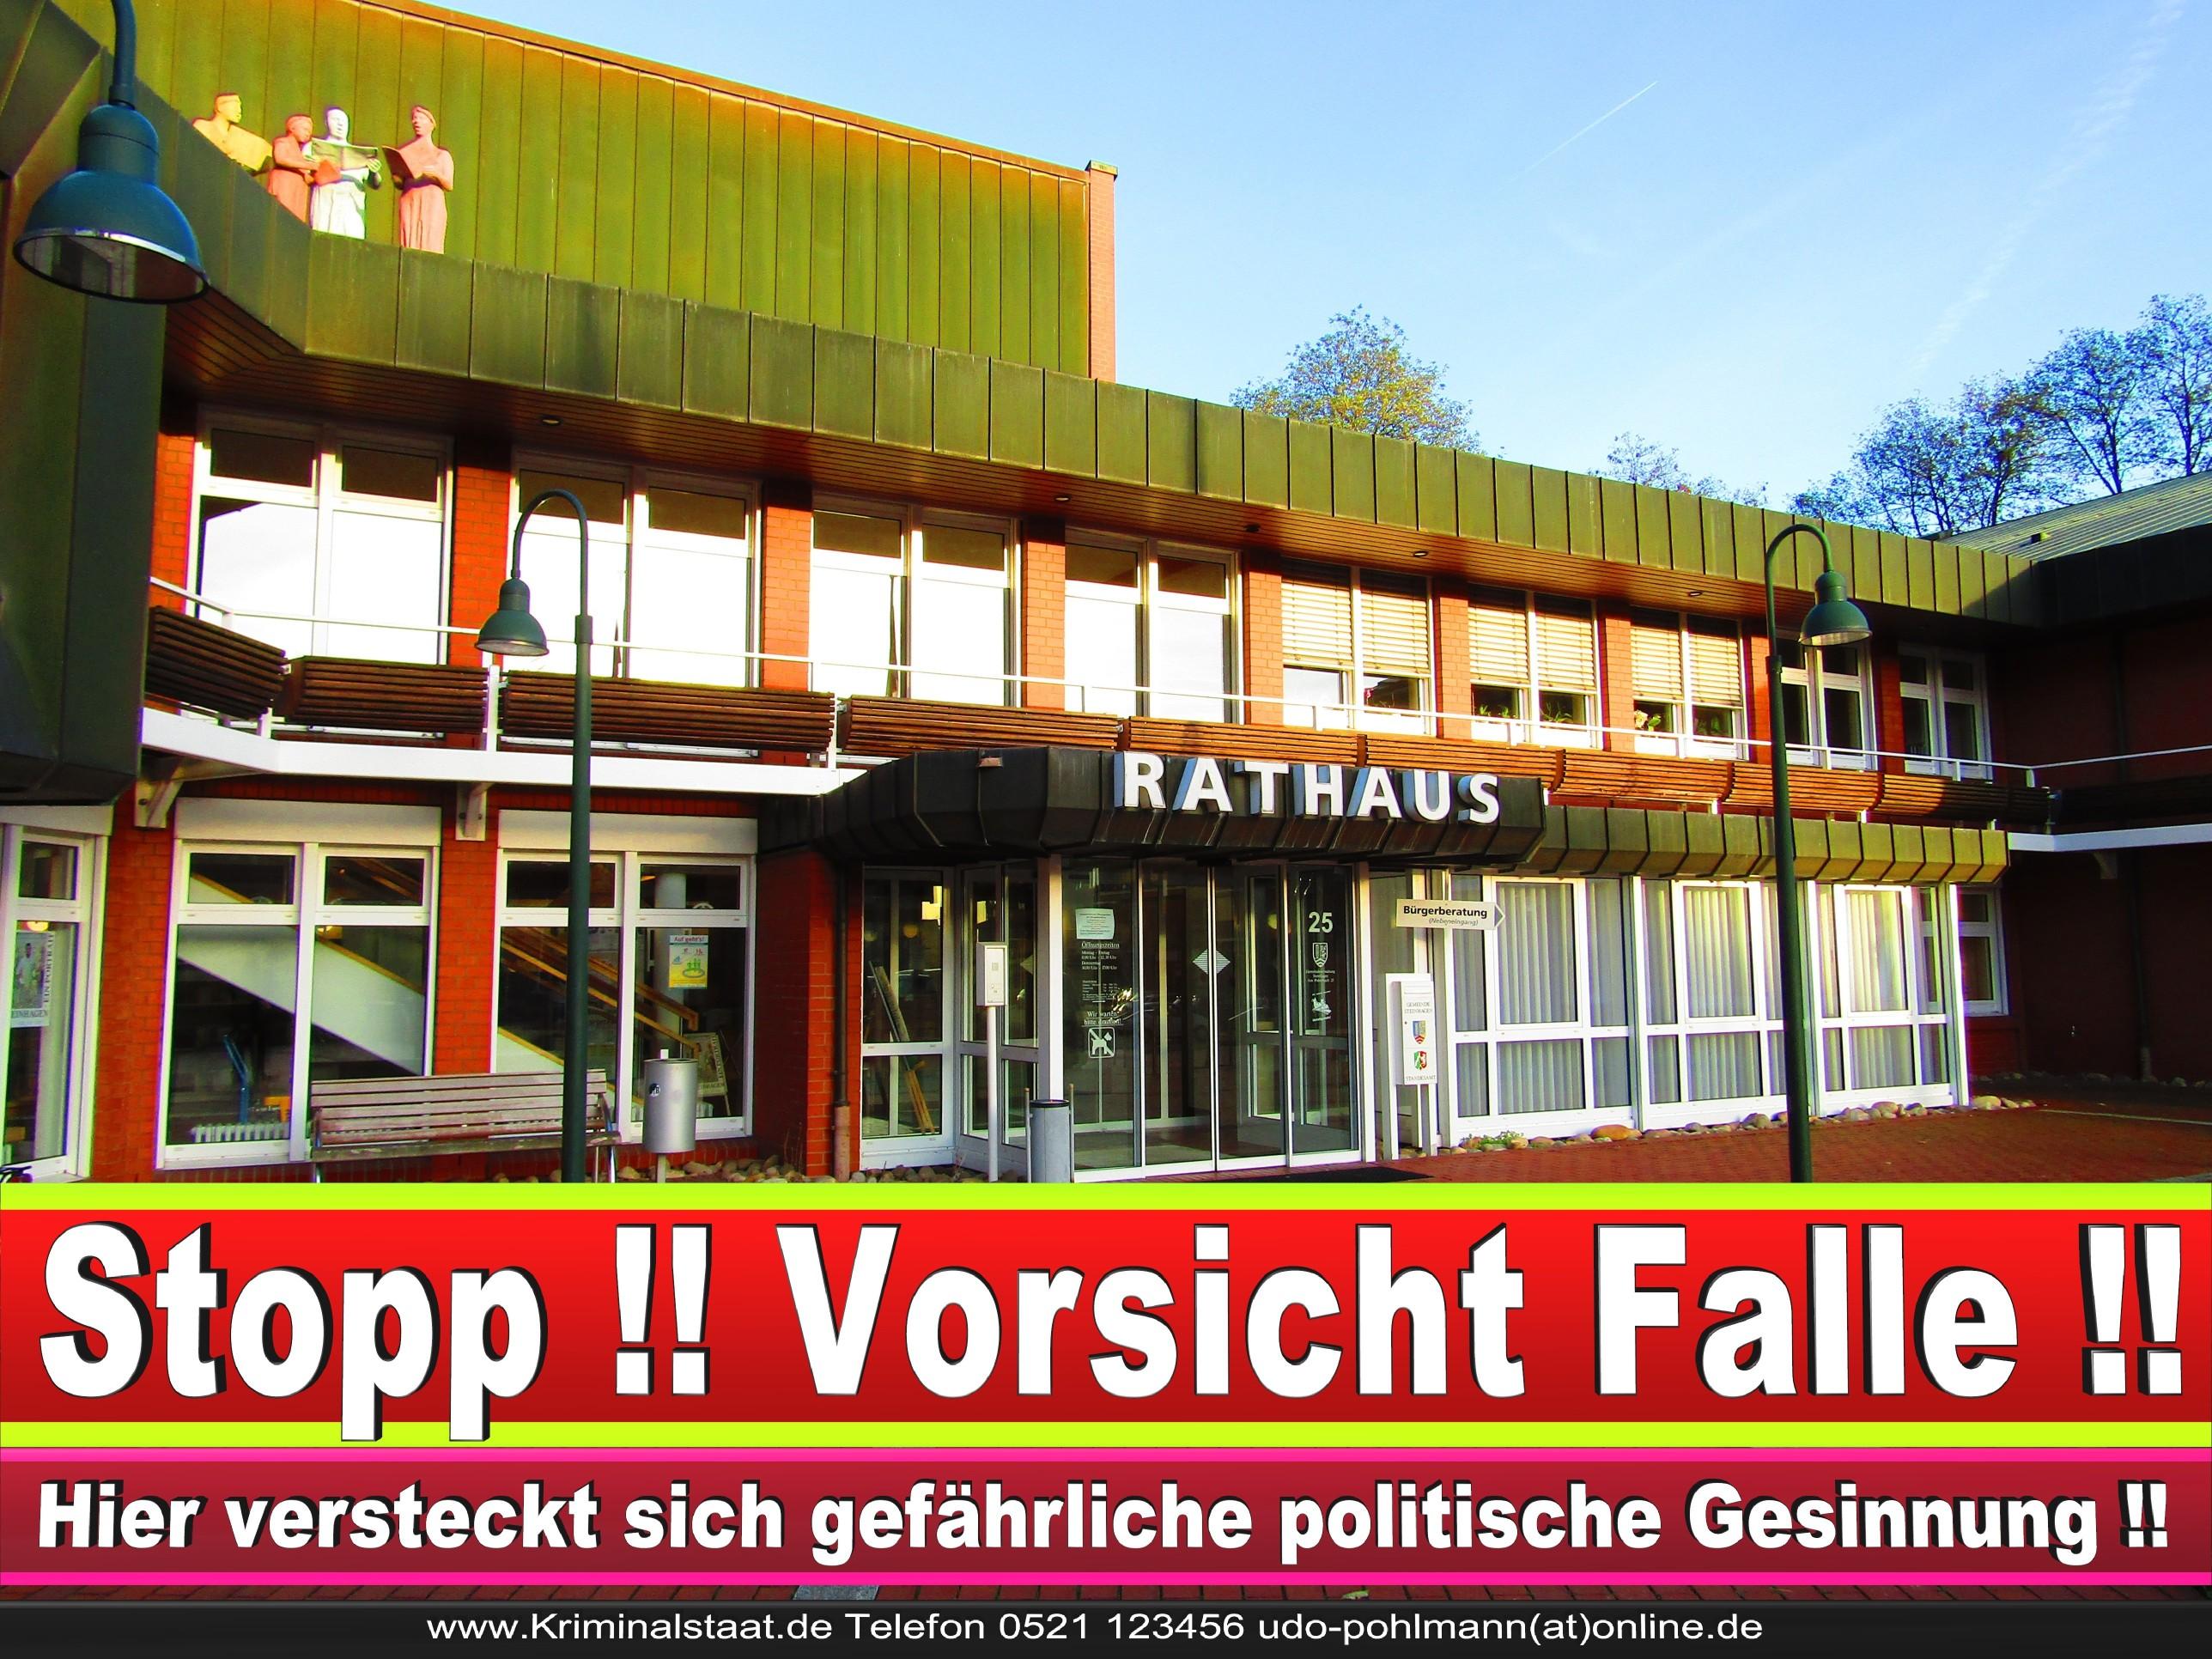 Rathaus Steinhagen CDU SPD FDP Ortsverband CDU Bürgerbüro CDU SPD Korruption Polizei Bürgermeister Karte Telefonbuch NRW OWL (20)